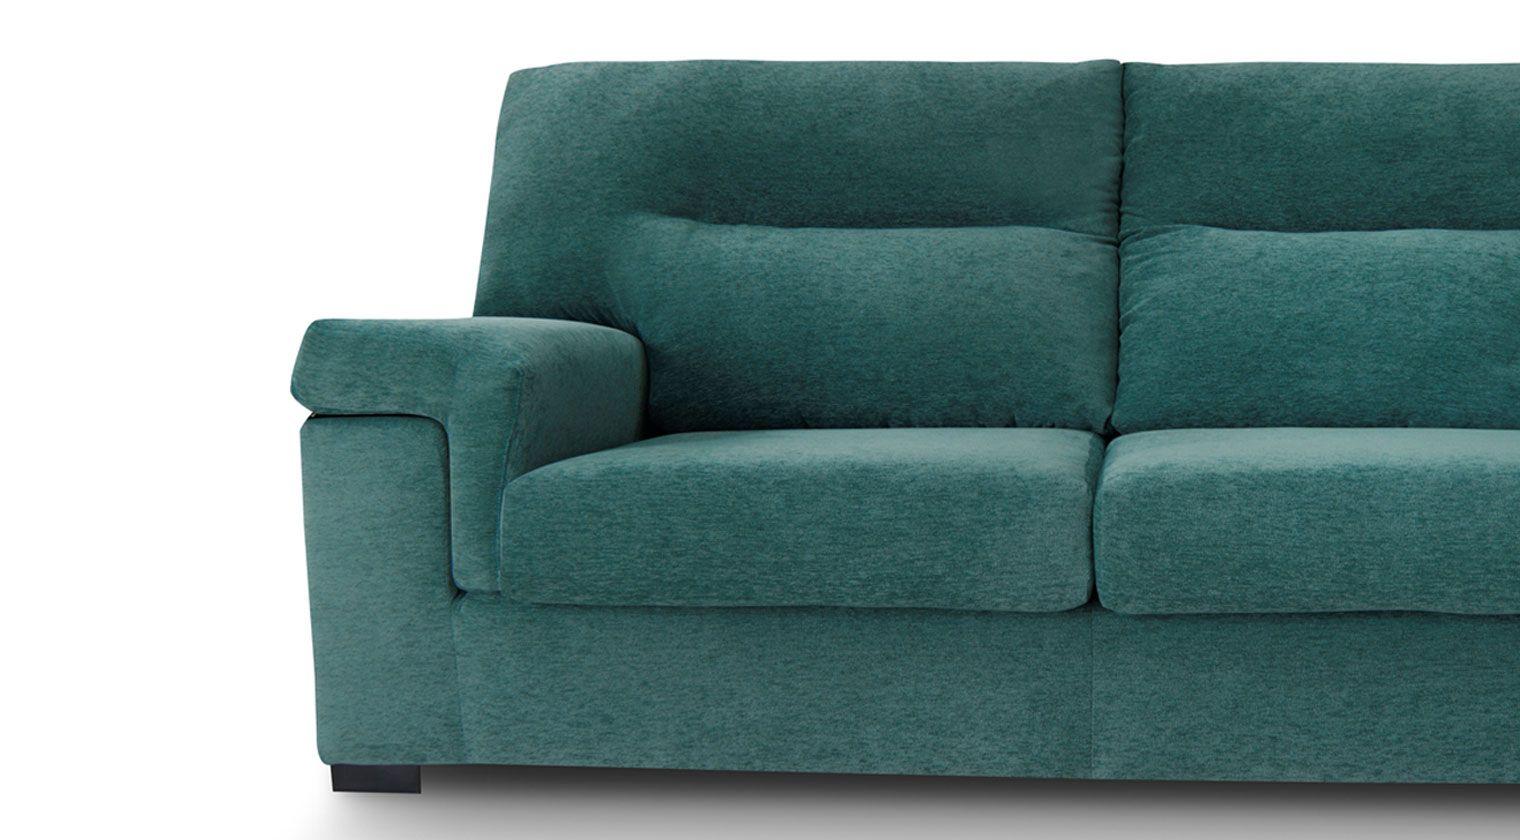 Comprar sof tela okio sof 3 plazas deslizante microfibra - Sofas de microfibra ...